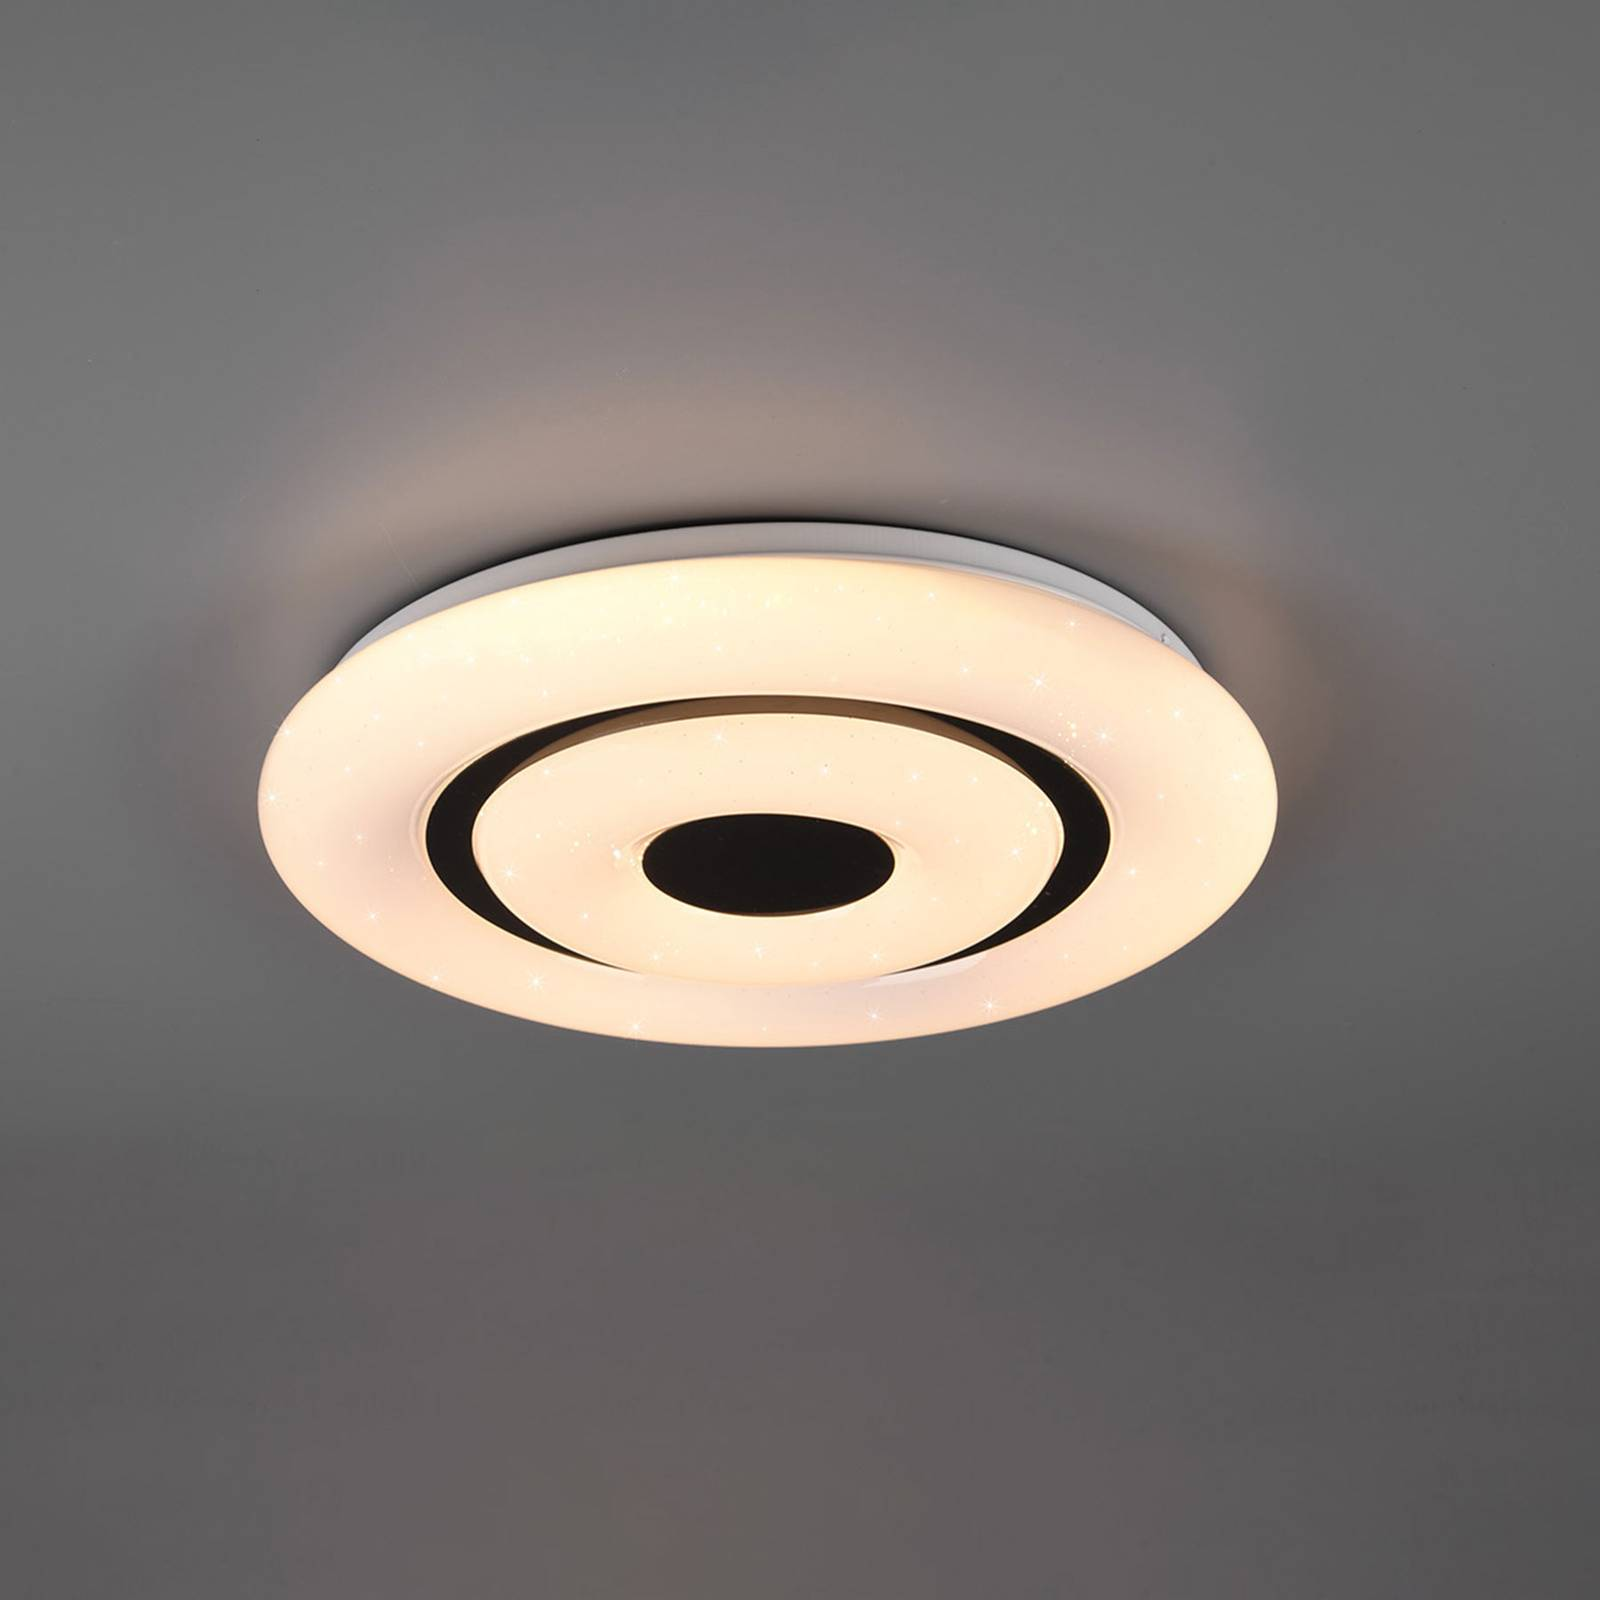 LED-Deckenleuchte Rana, RGB, CCT, WiZ, Ø 40 cm